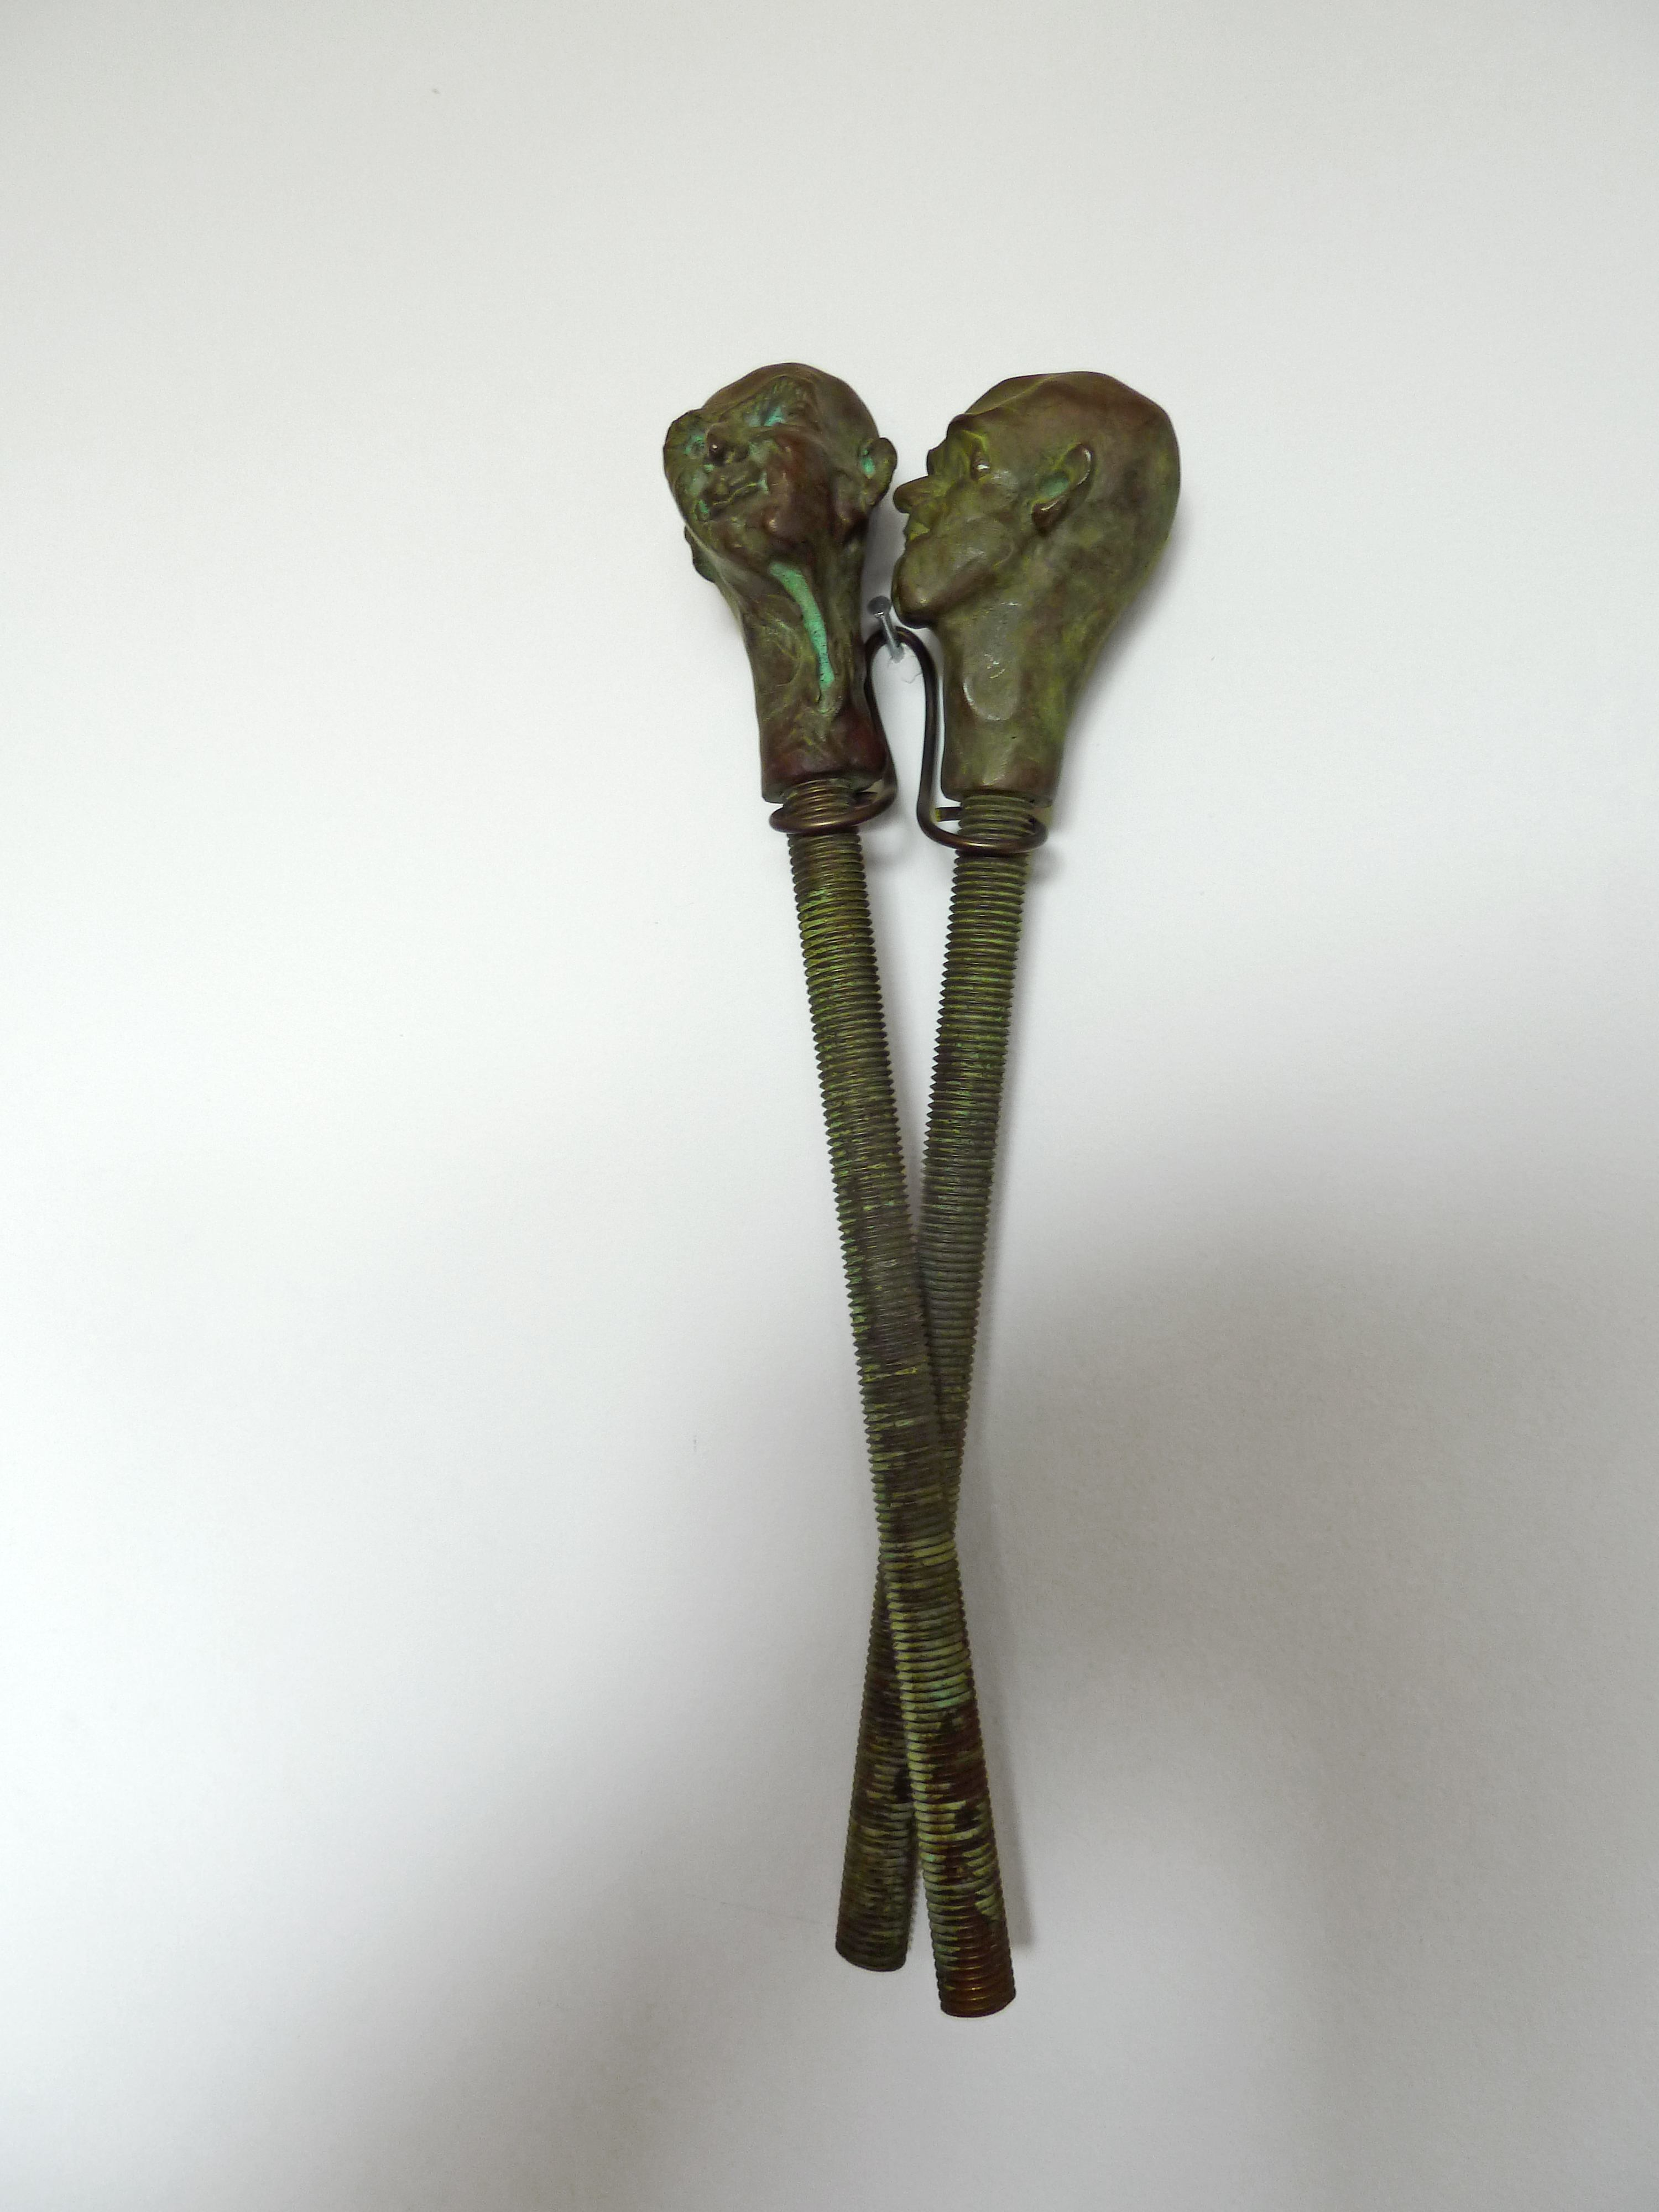 Thomas SCHÜTTE, United Enemies, 1997, Bronze, steel, copper, Edition 6 of 10 +2AP, 34x 5 x 6 cm